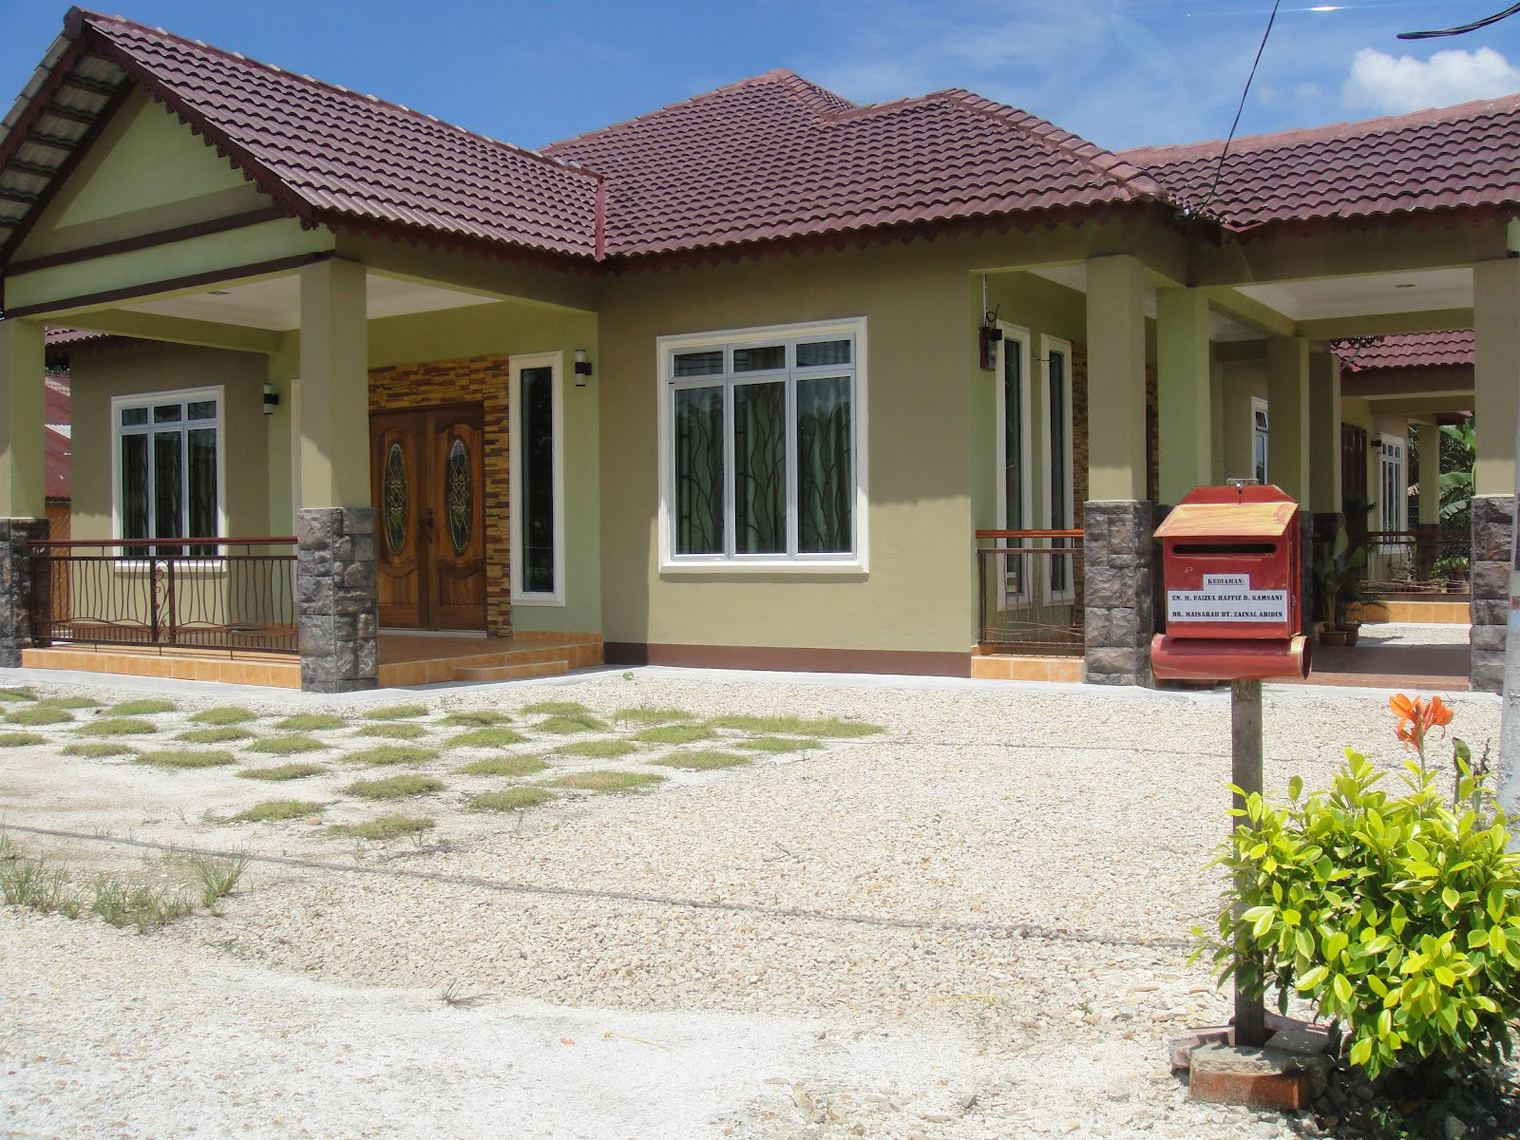 Reka bentuk tiang depan rumah & Reka bentuk motif tiang teras bahagian depan rumah moden minimalis ...